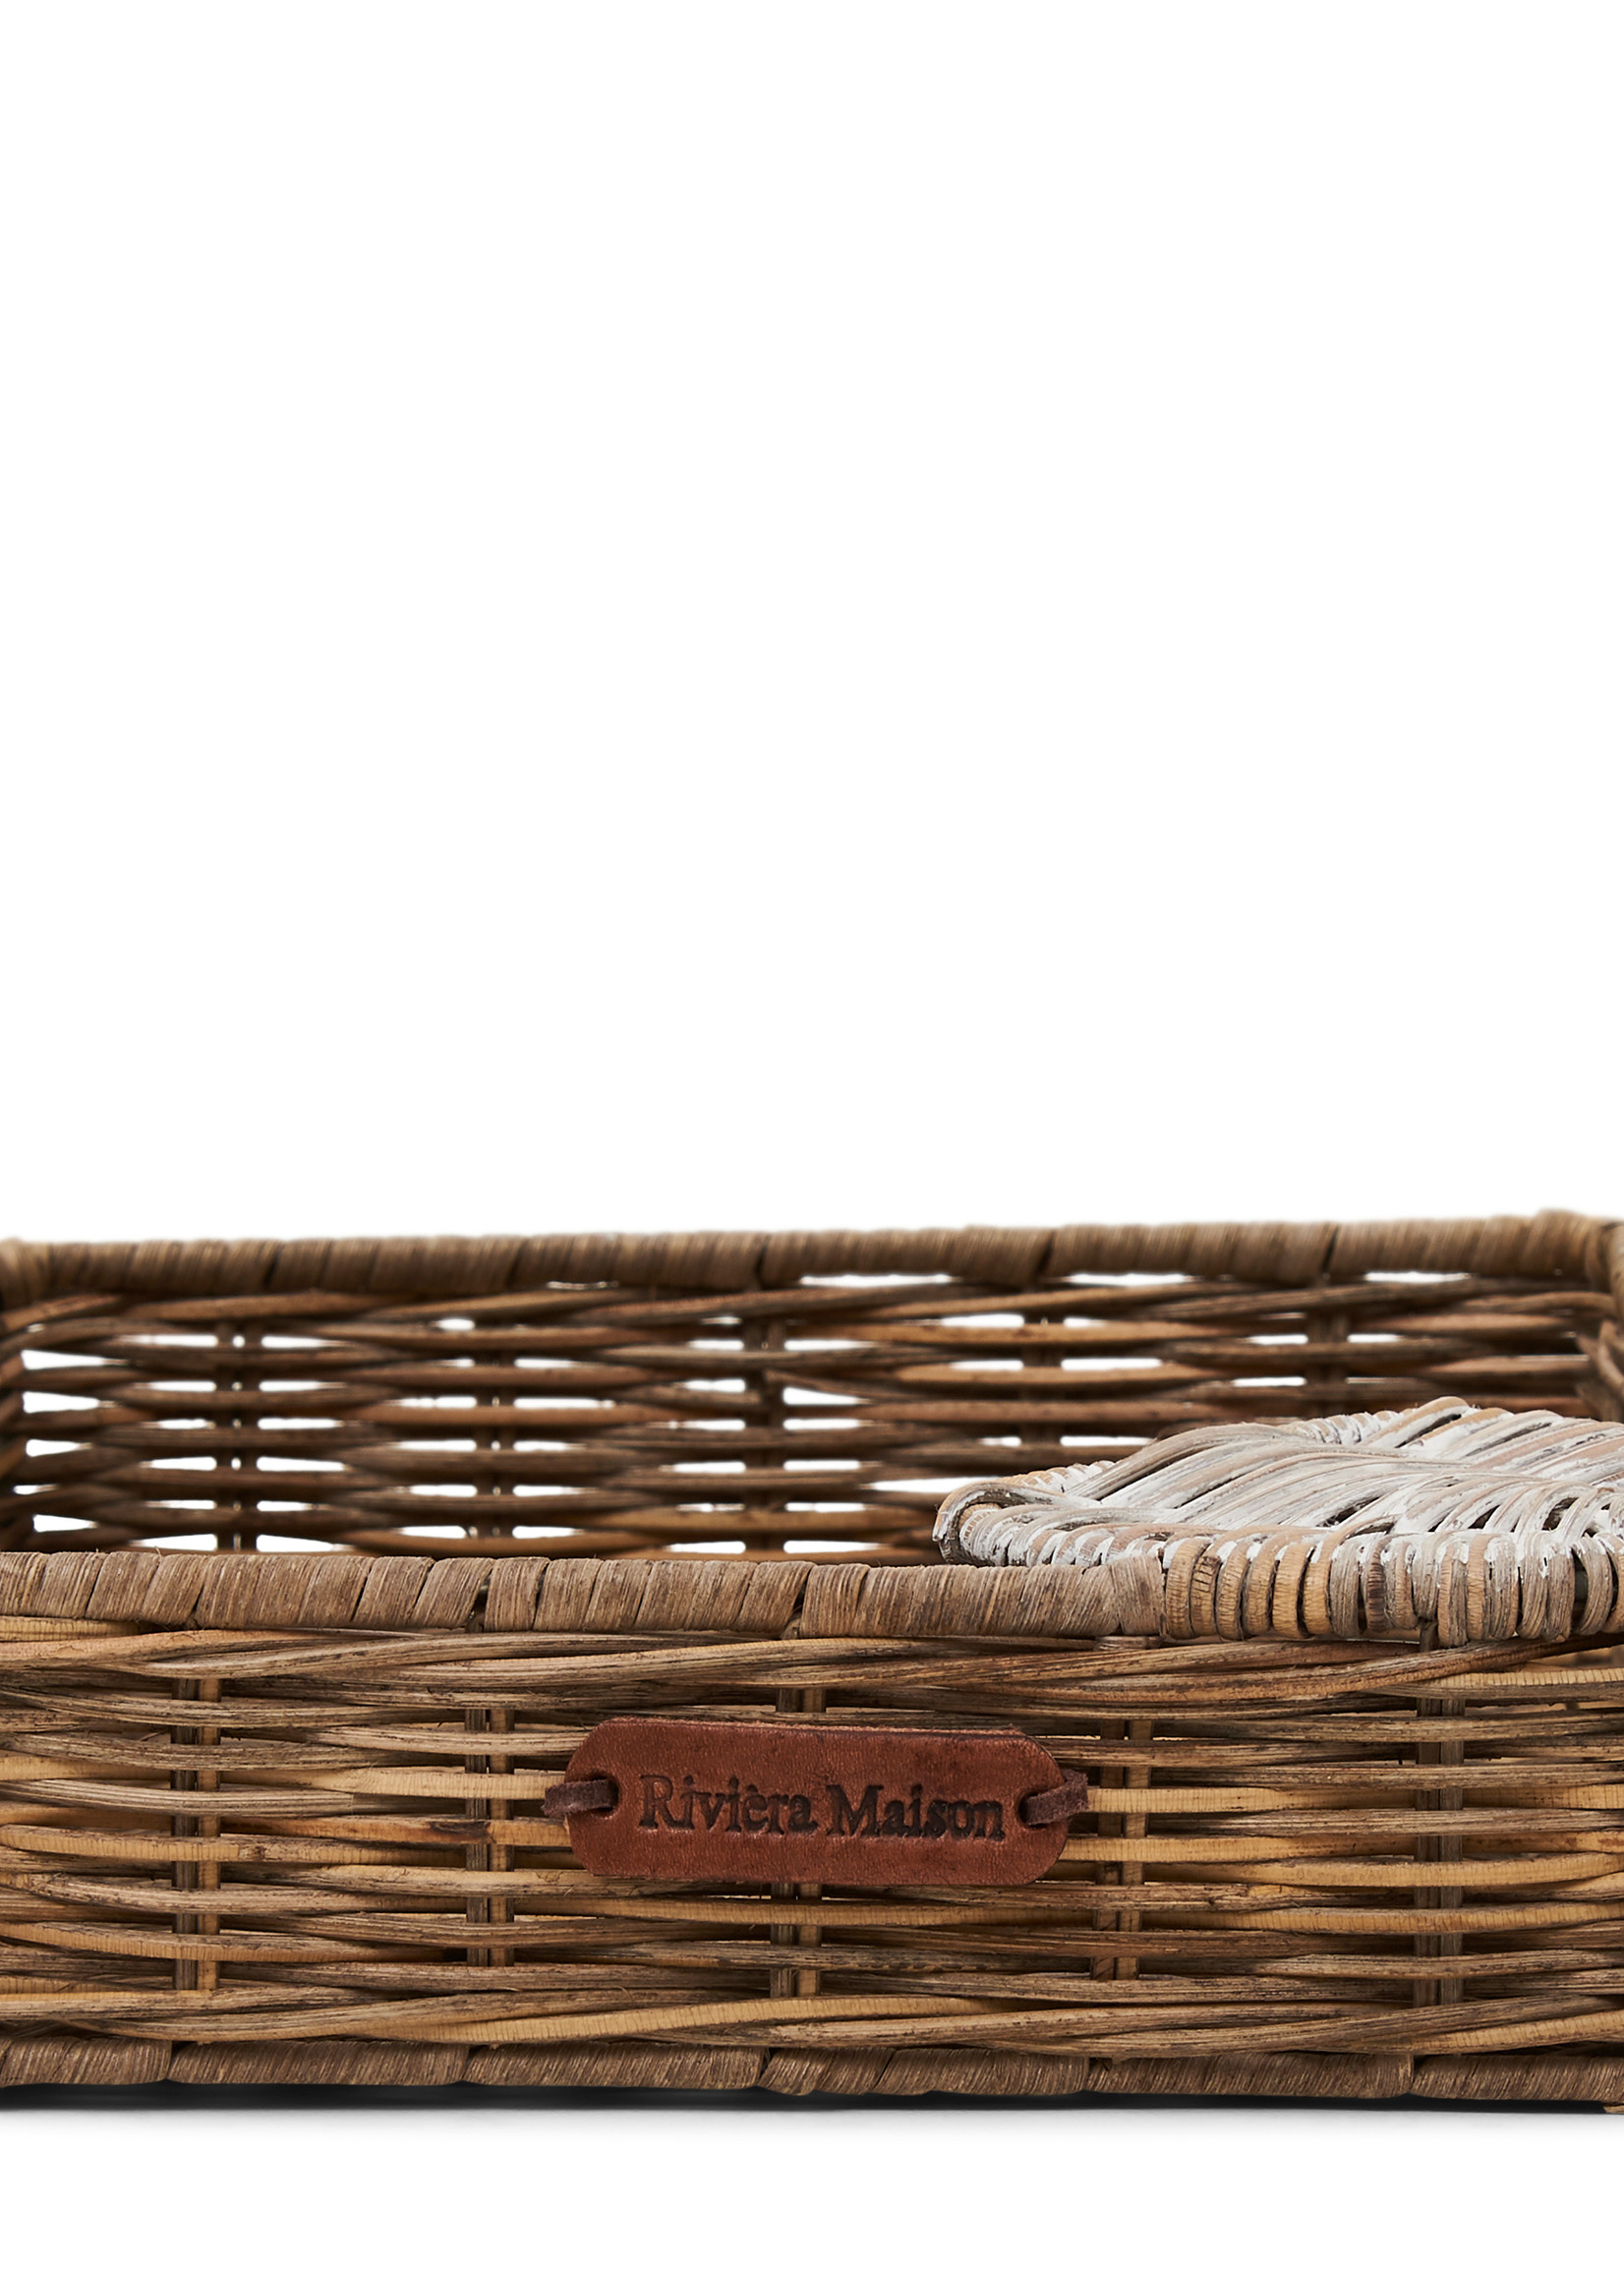 Riviera Maison Rustic rattan Heart Napkin Holder